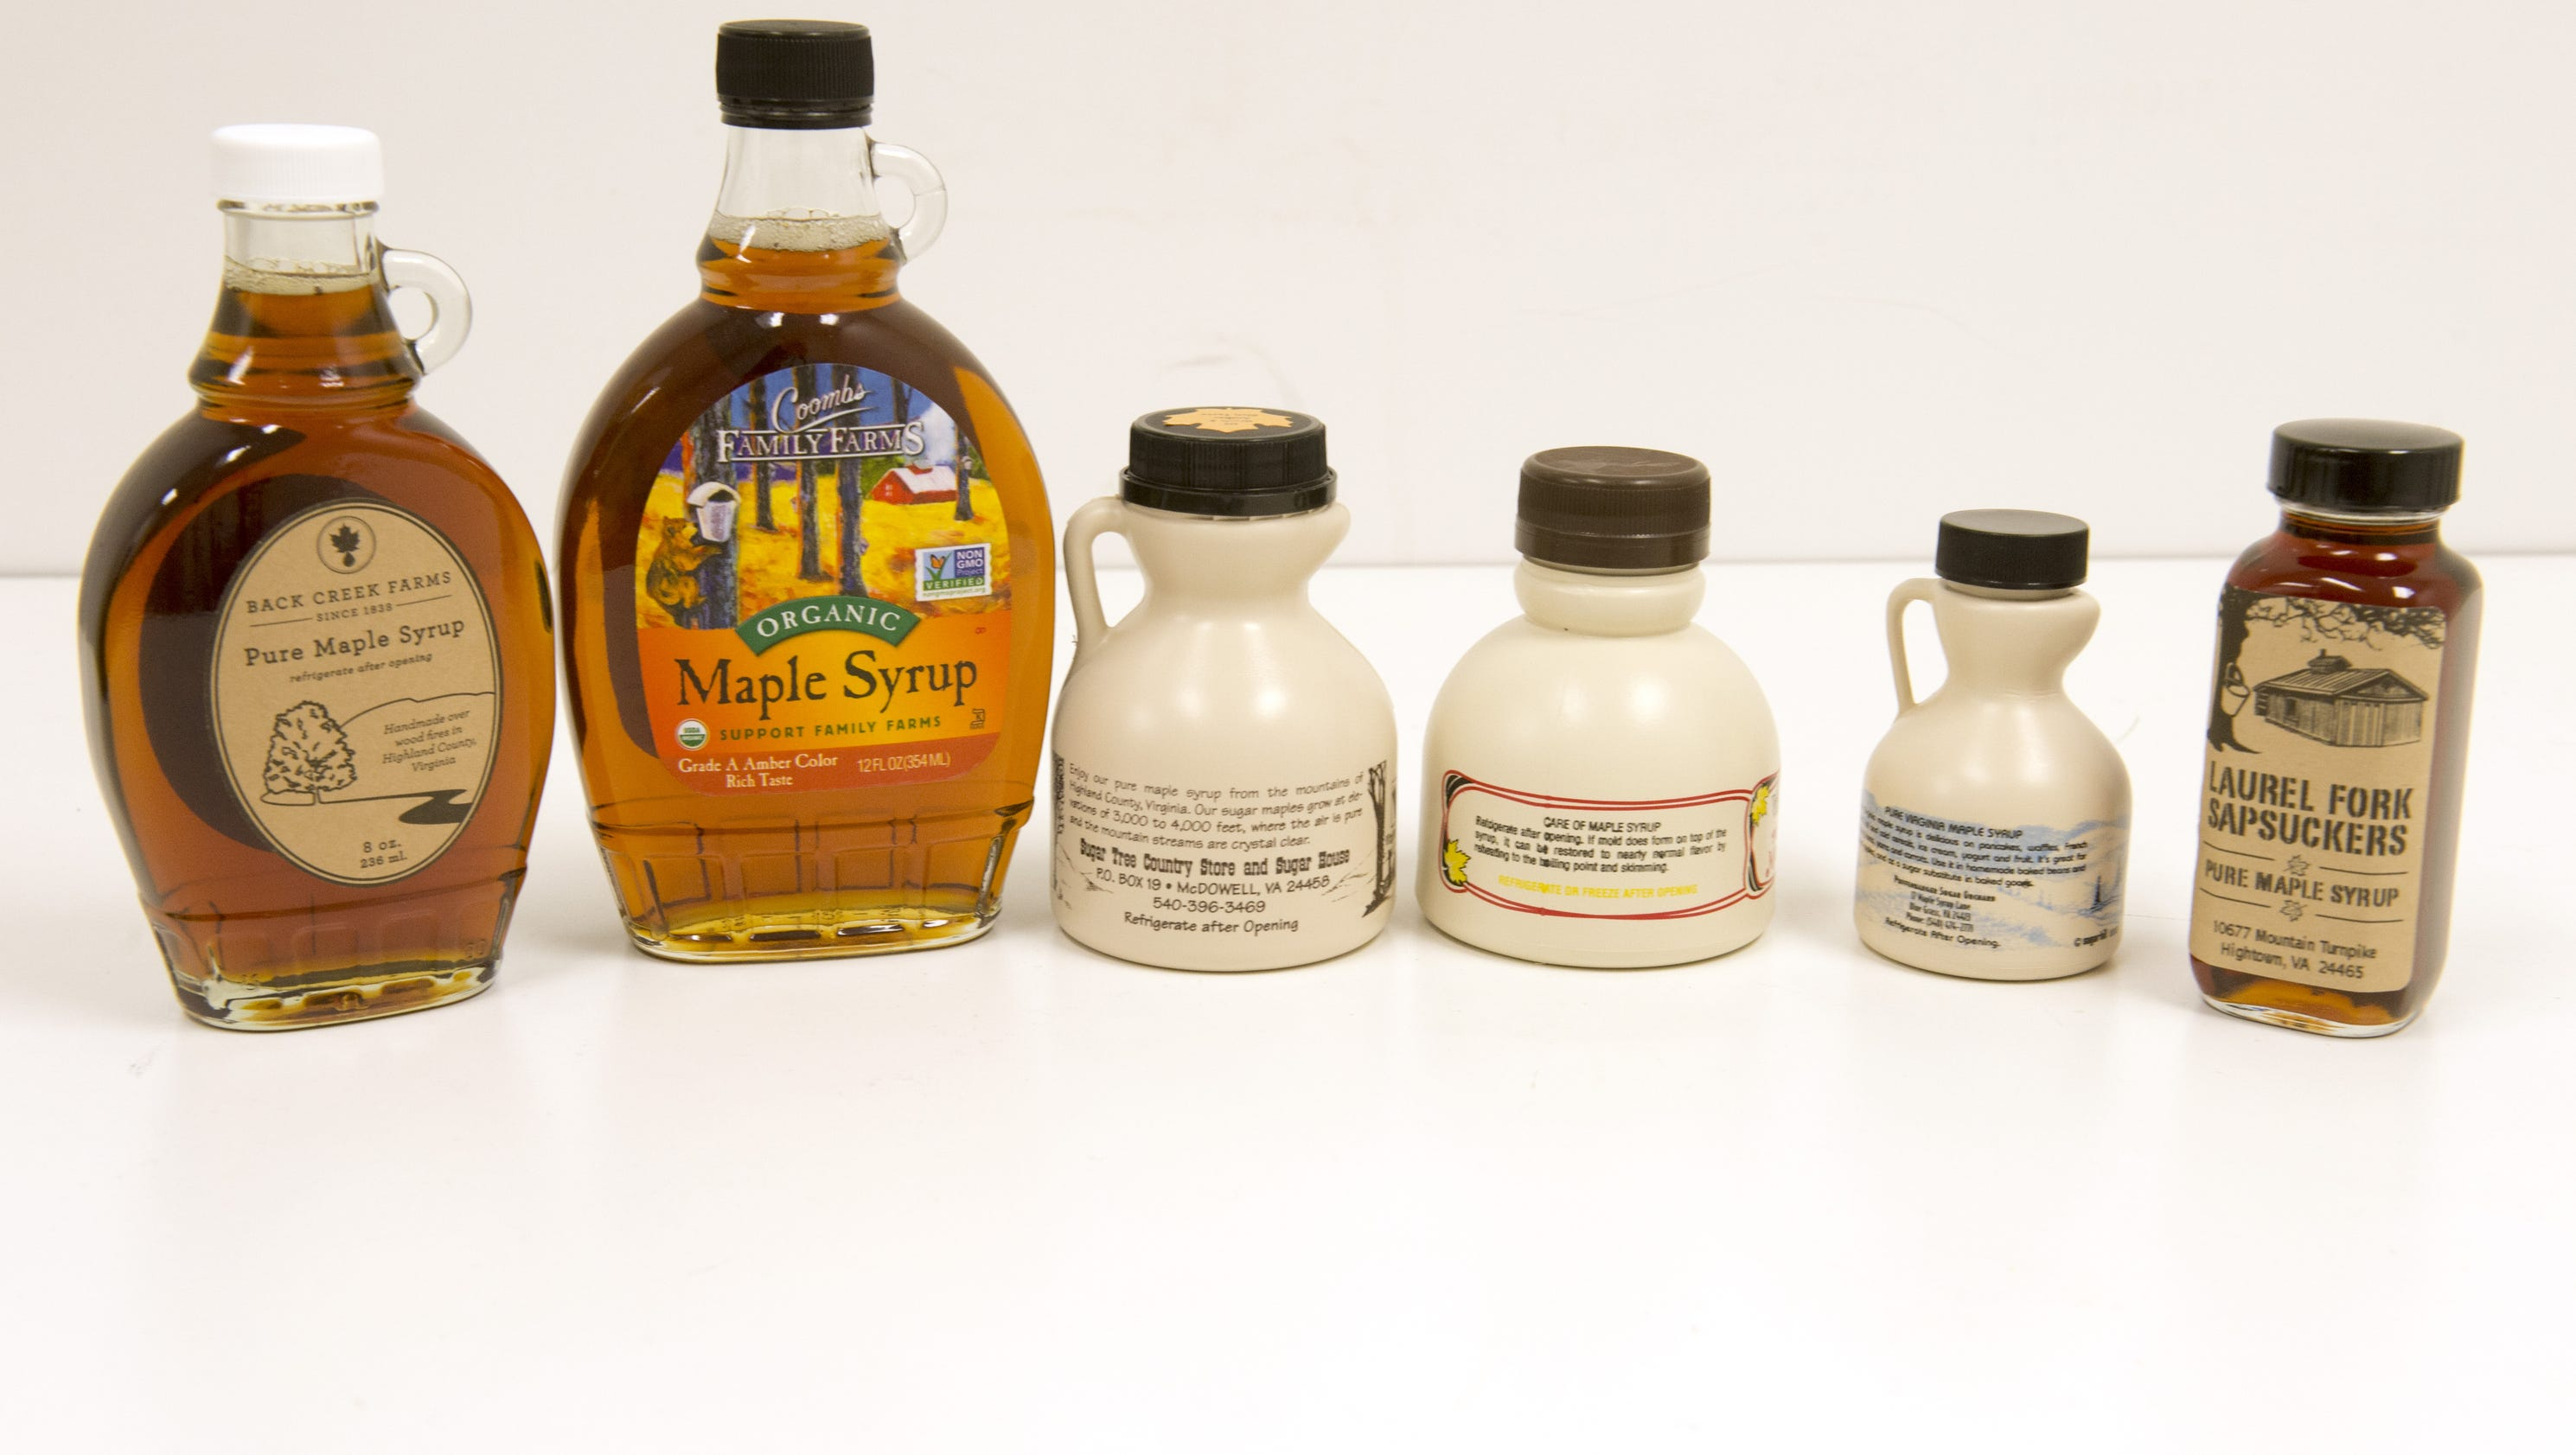 Maple syrup tasting sperm